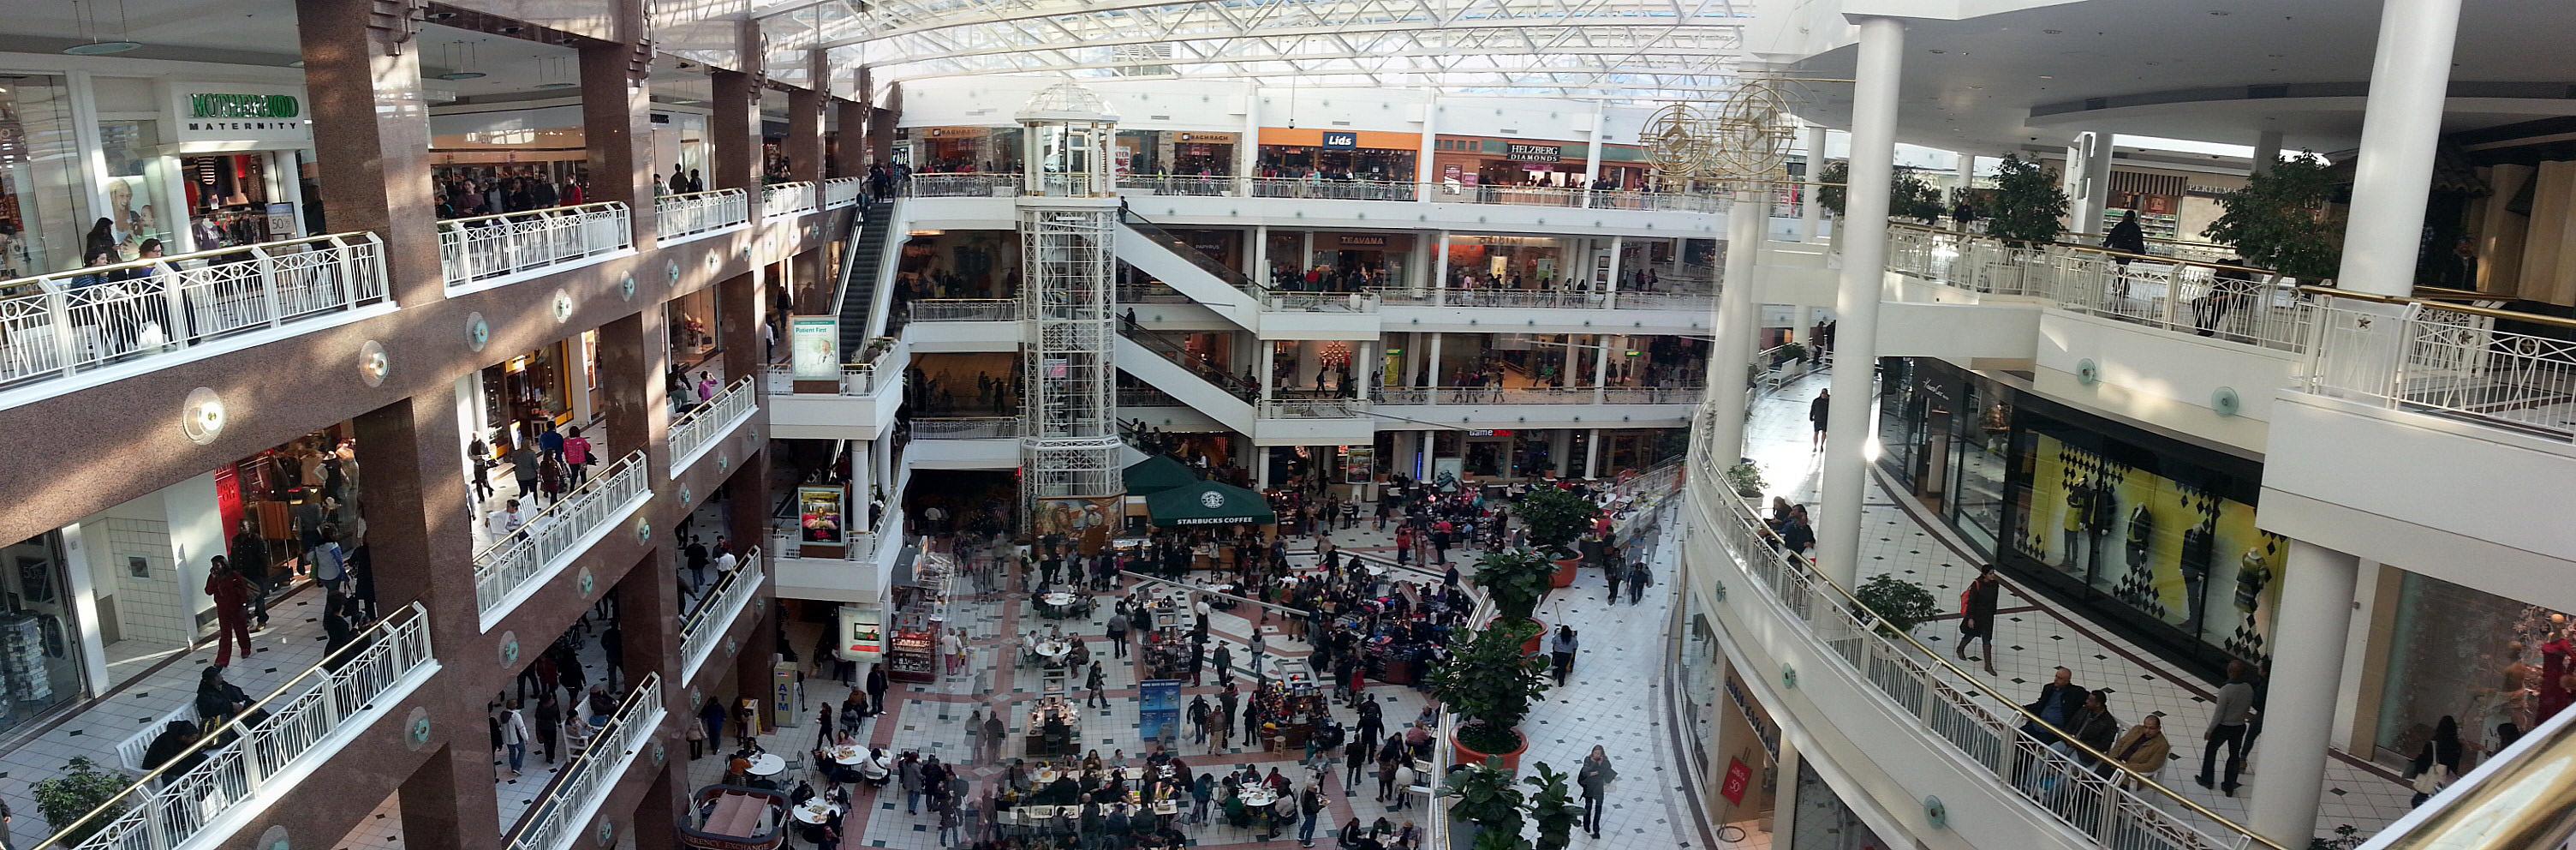 Pentagon City Mall Parking Cost